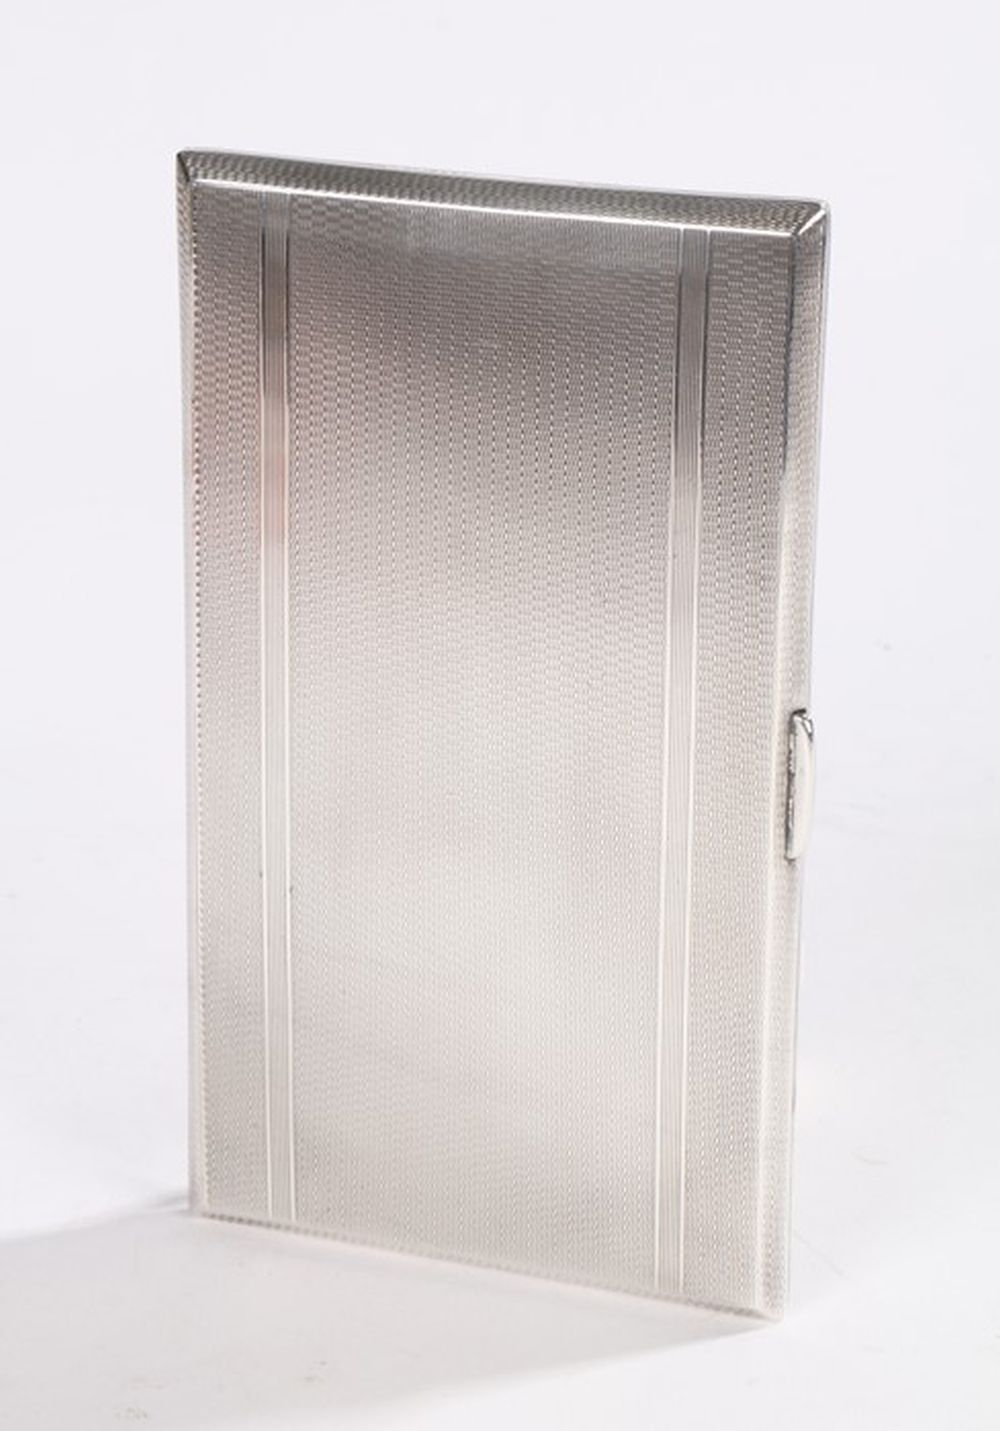 Elizabeth II silver cigarette case, Chester 1946, maker Wayne Hart & Co, with engine turned interior